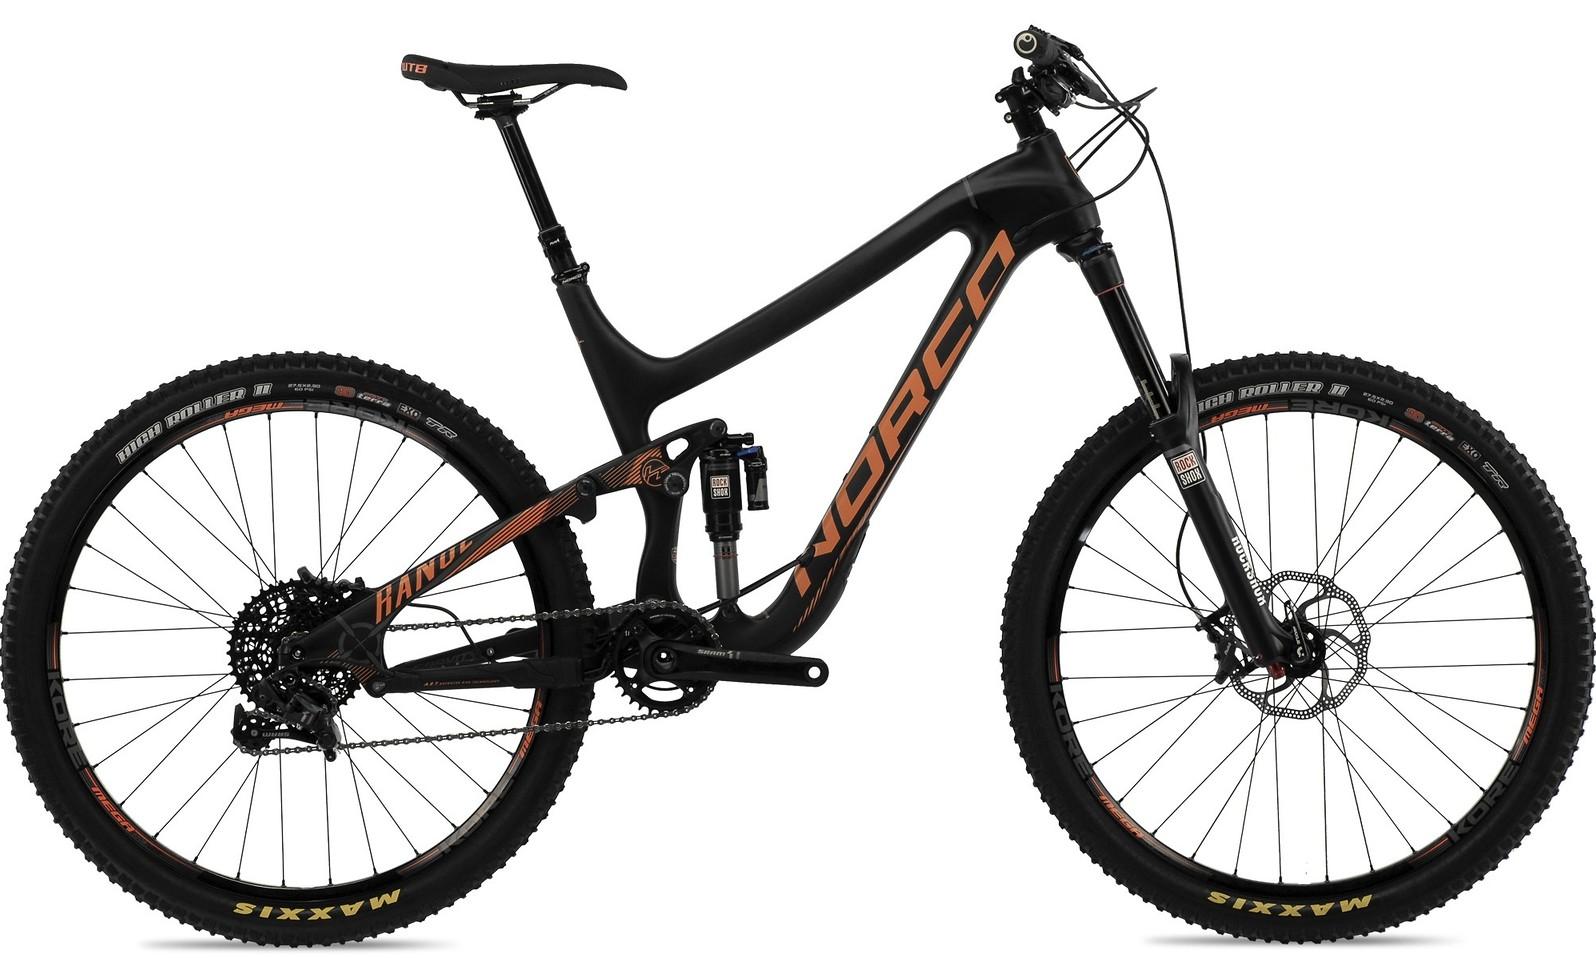 bike - 2014 Norco Range Carbon 7.1